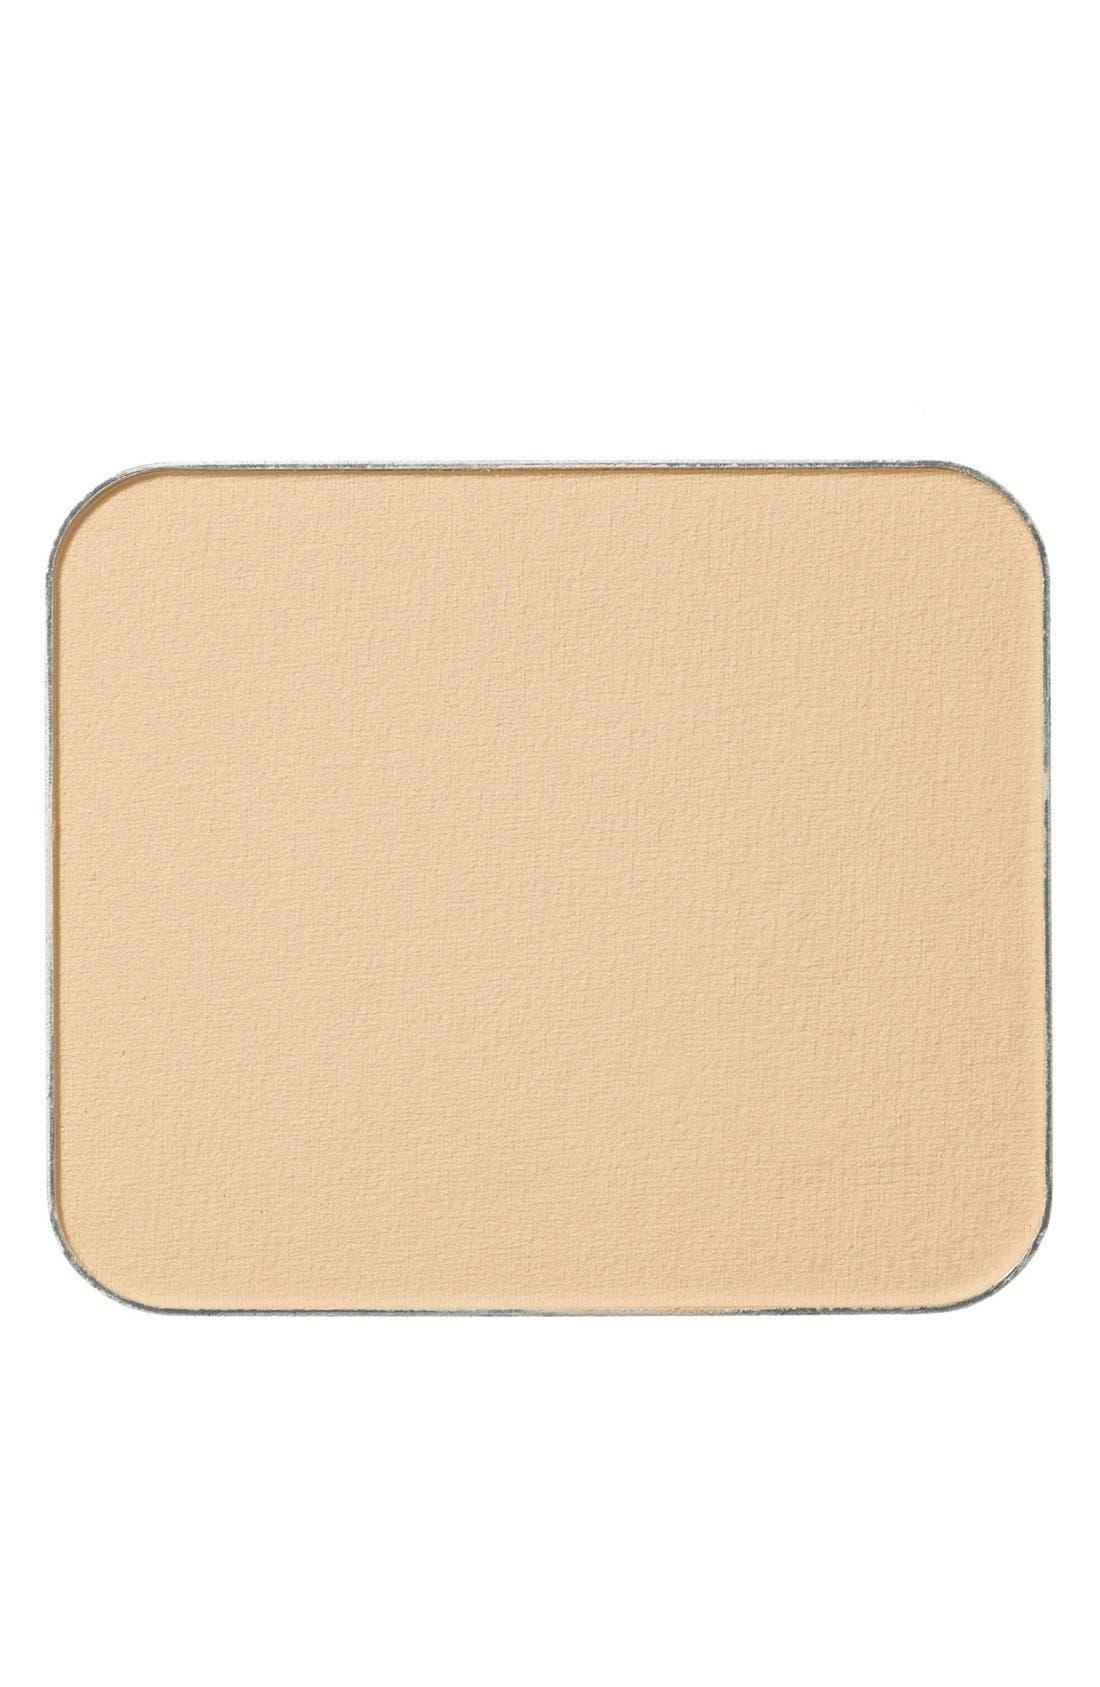 Maifanshi Silky Moisture Powder Compact Refill,                         Main,                         color, 255